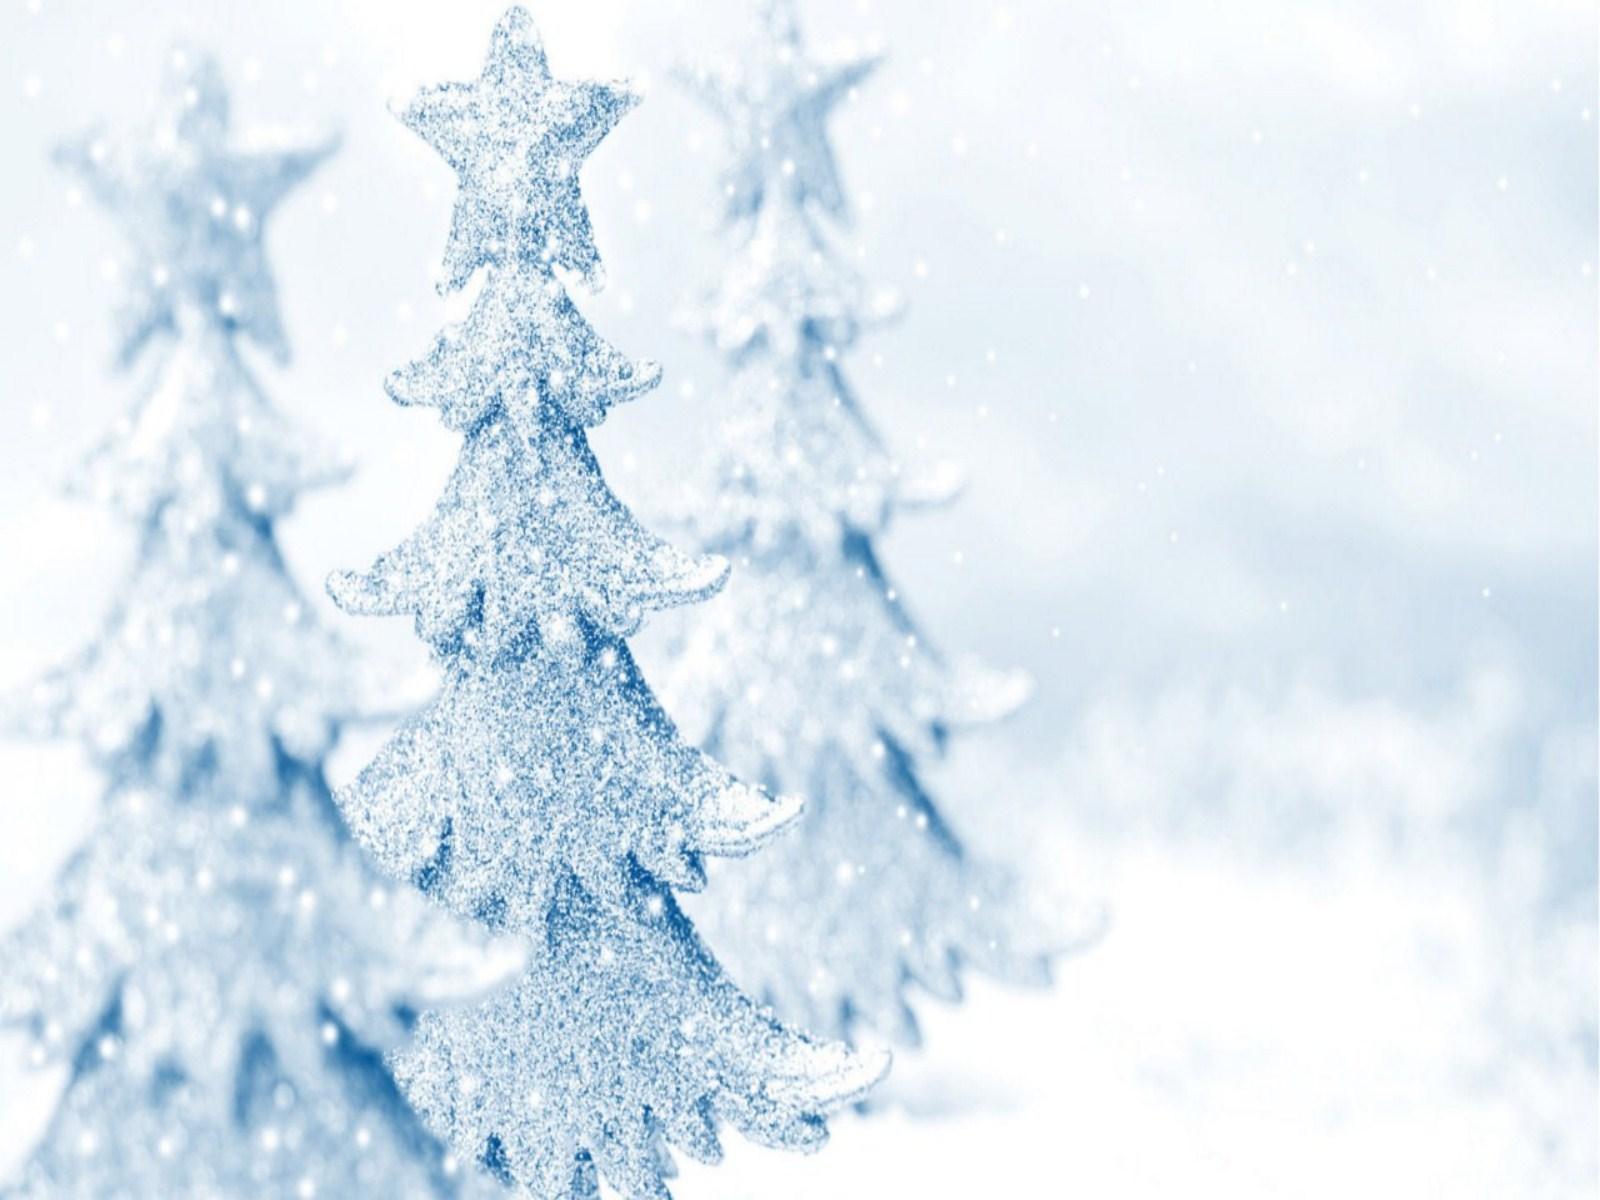 Christmas Snowman Wallpaper Winter Hd Phone Wallpapers 1600x1200